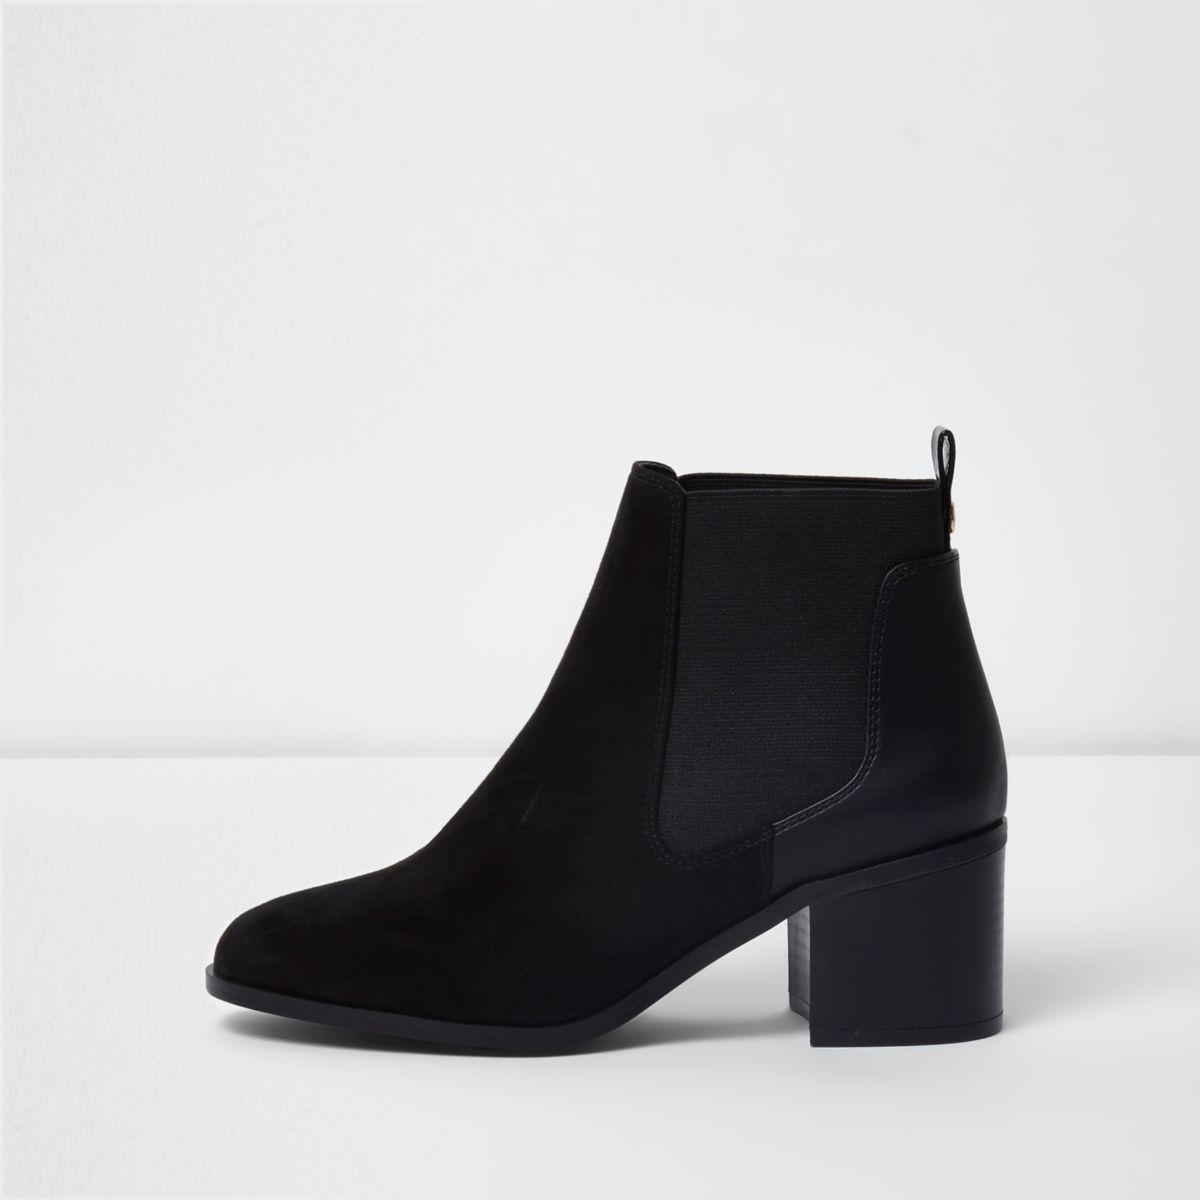 Women's Stacked Heel Ankle Chelsea Boot